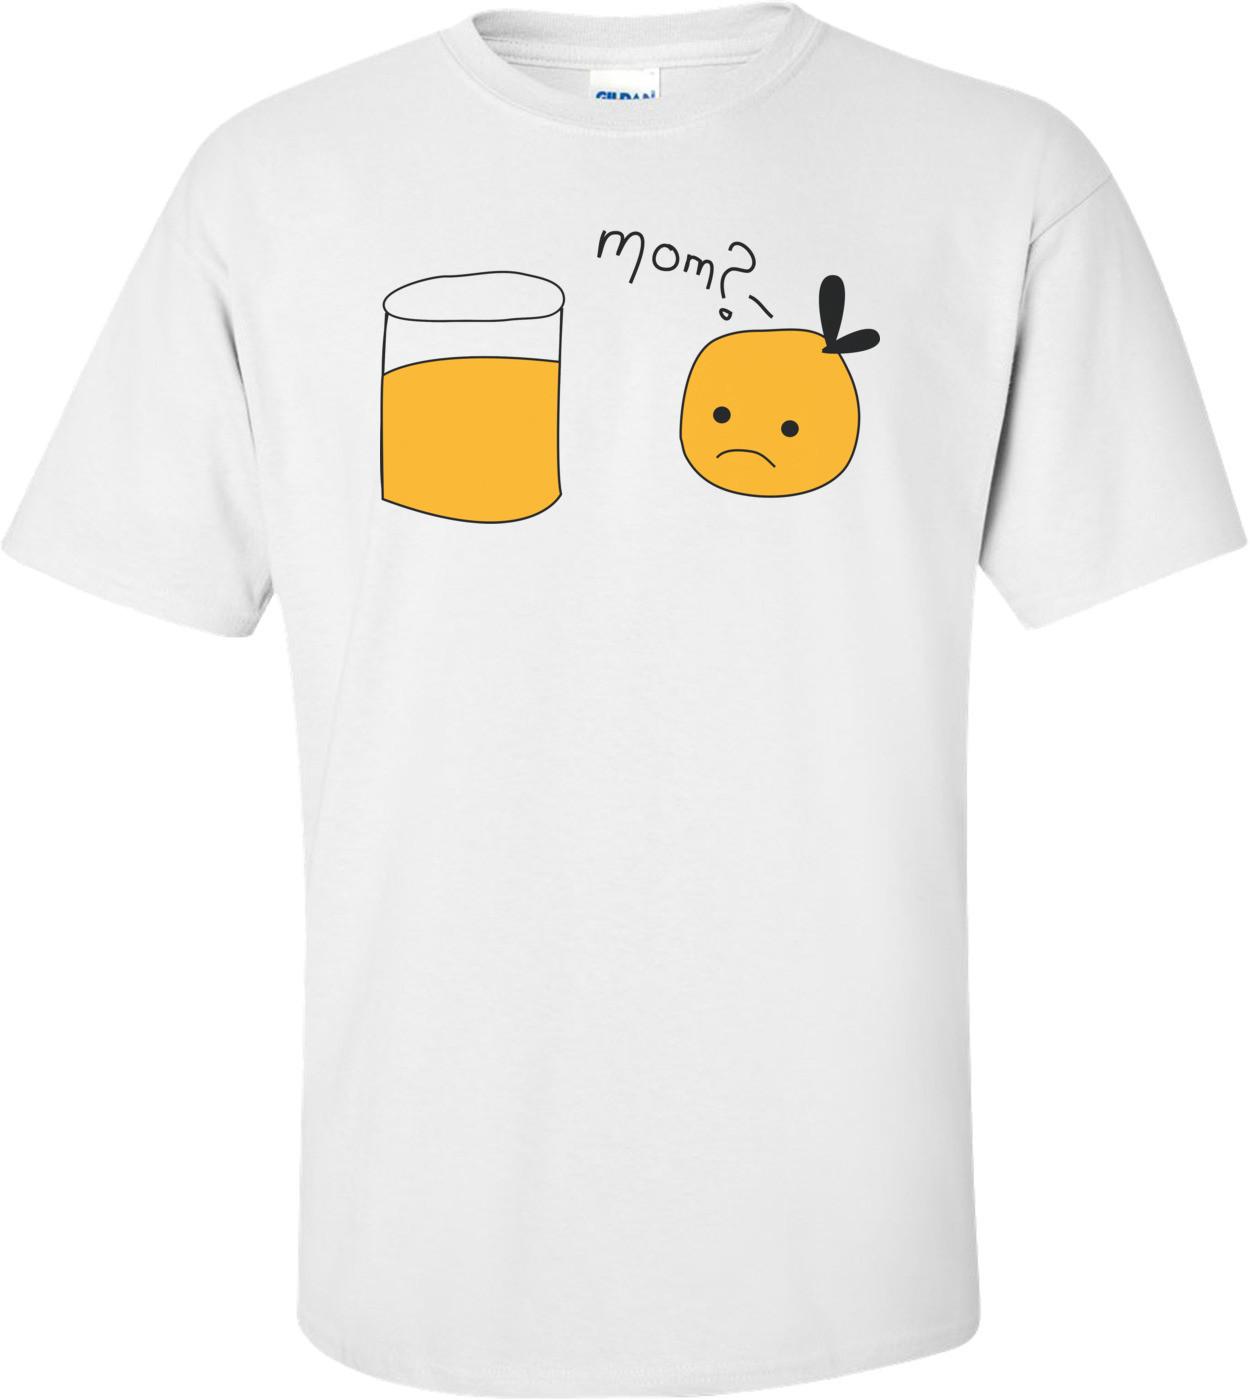 Mom? Orange Juice Funny Shirt